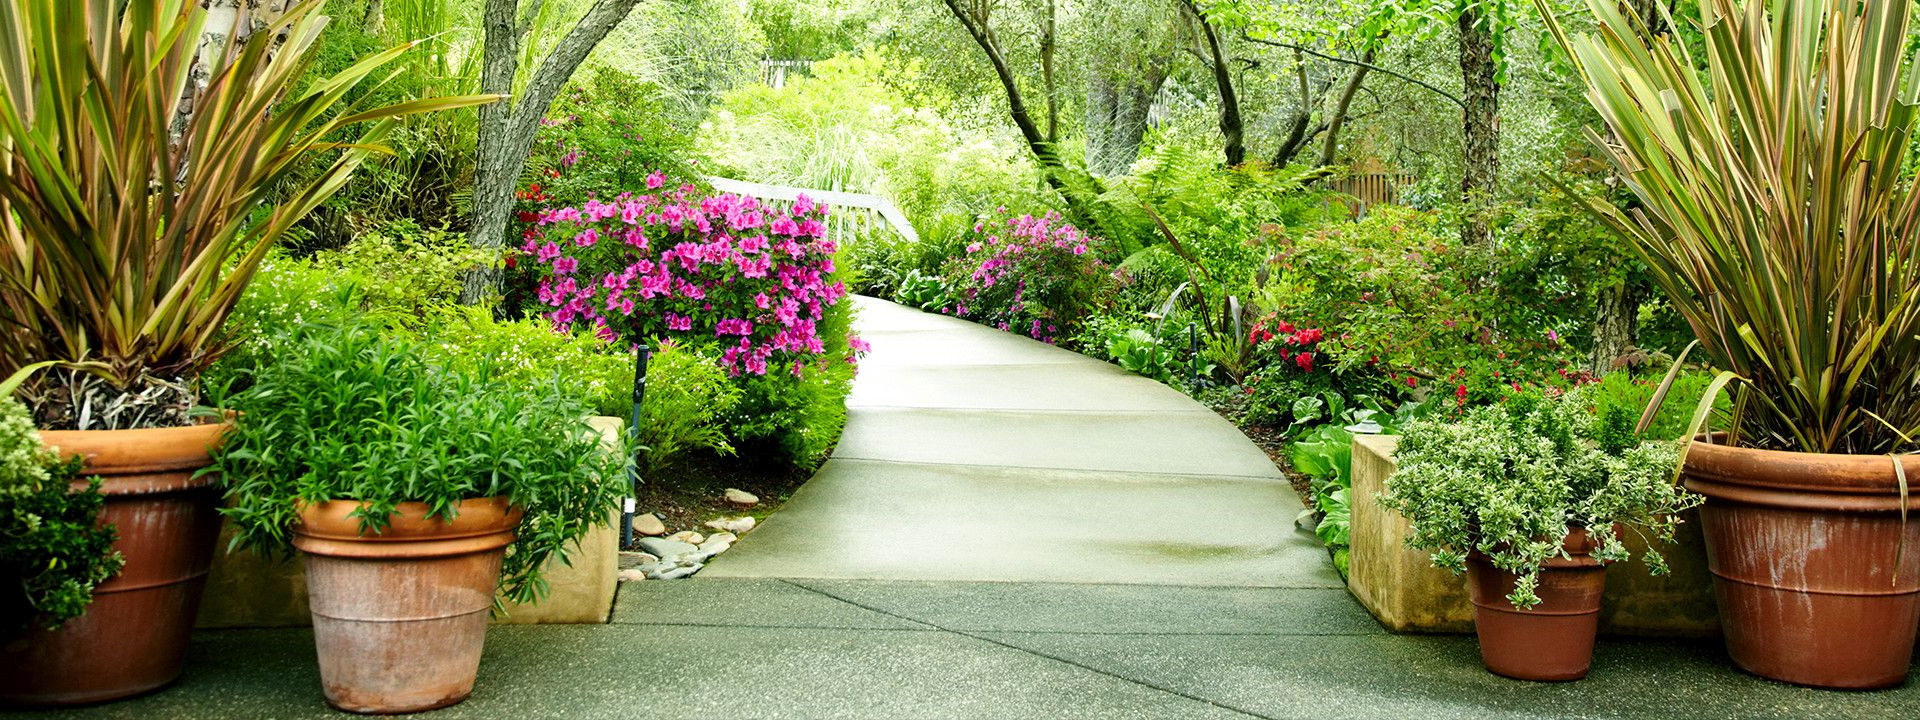 Resources | Bellerive Gardens Cemetery